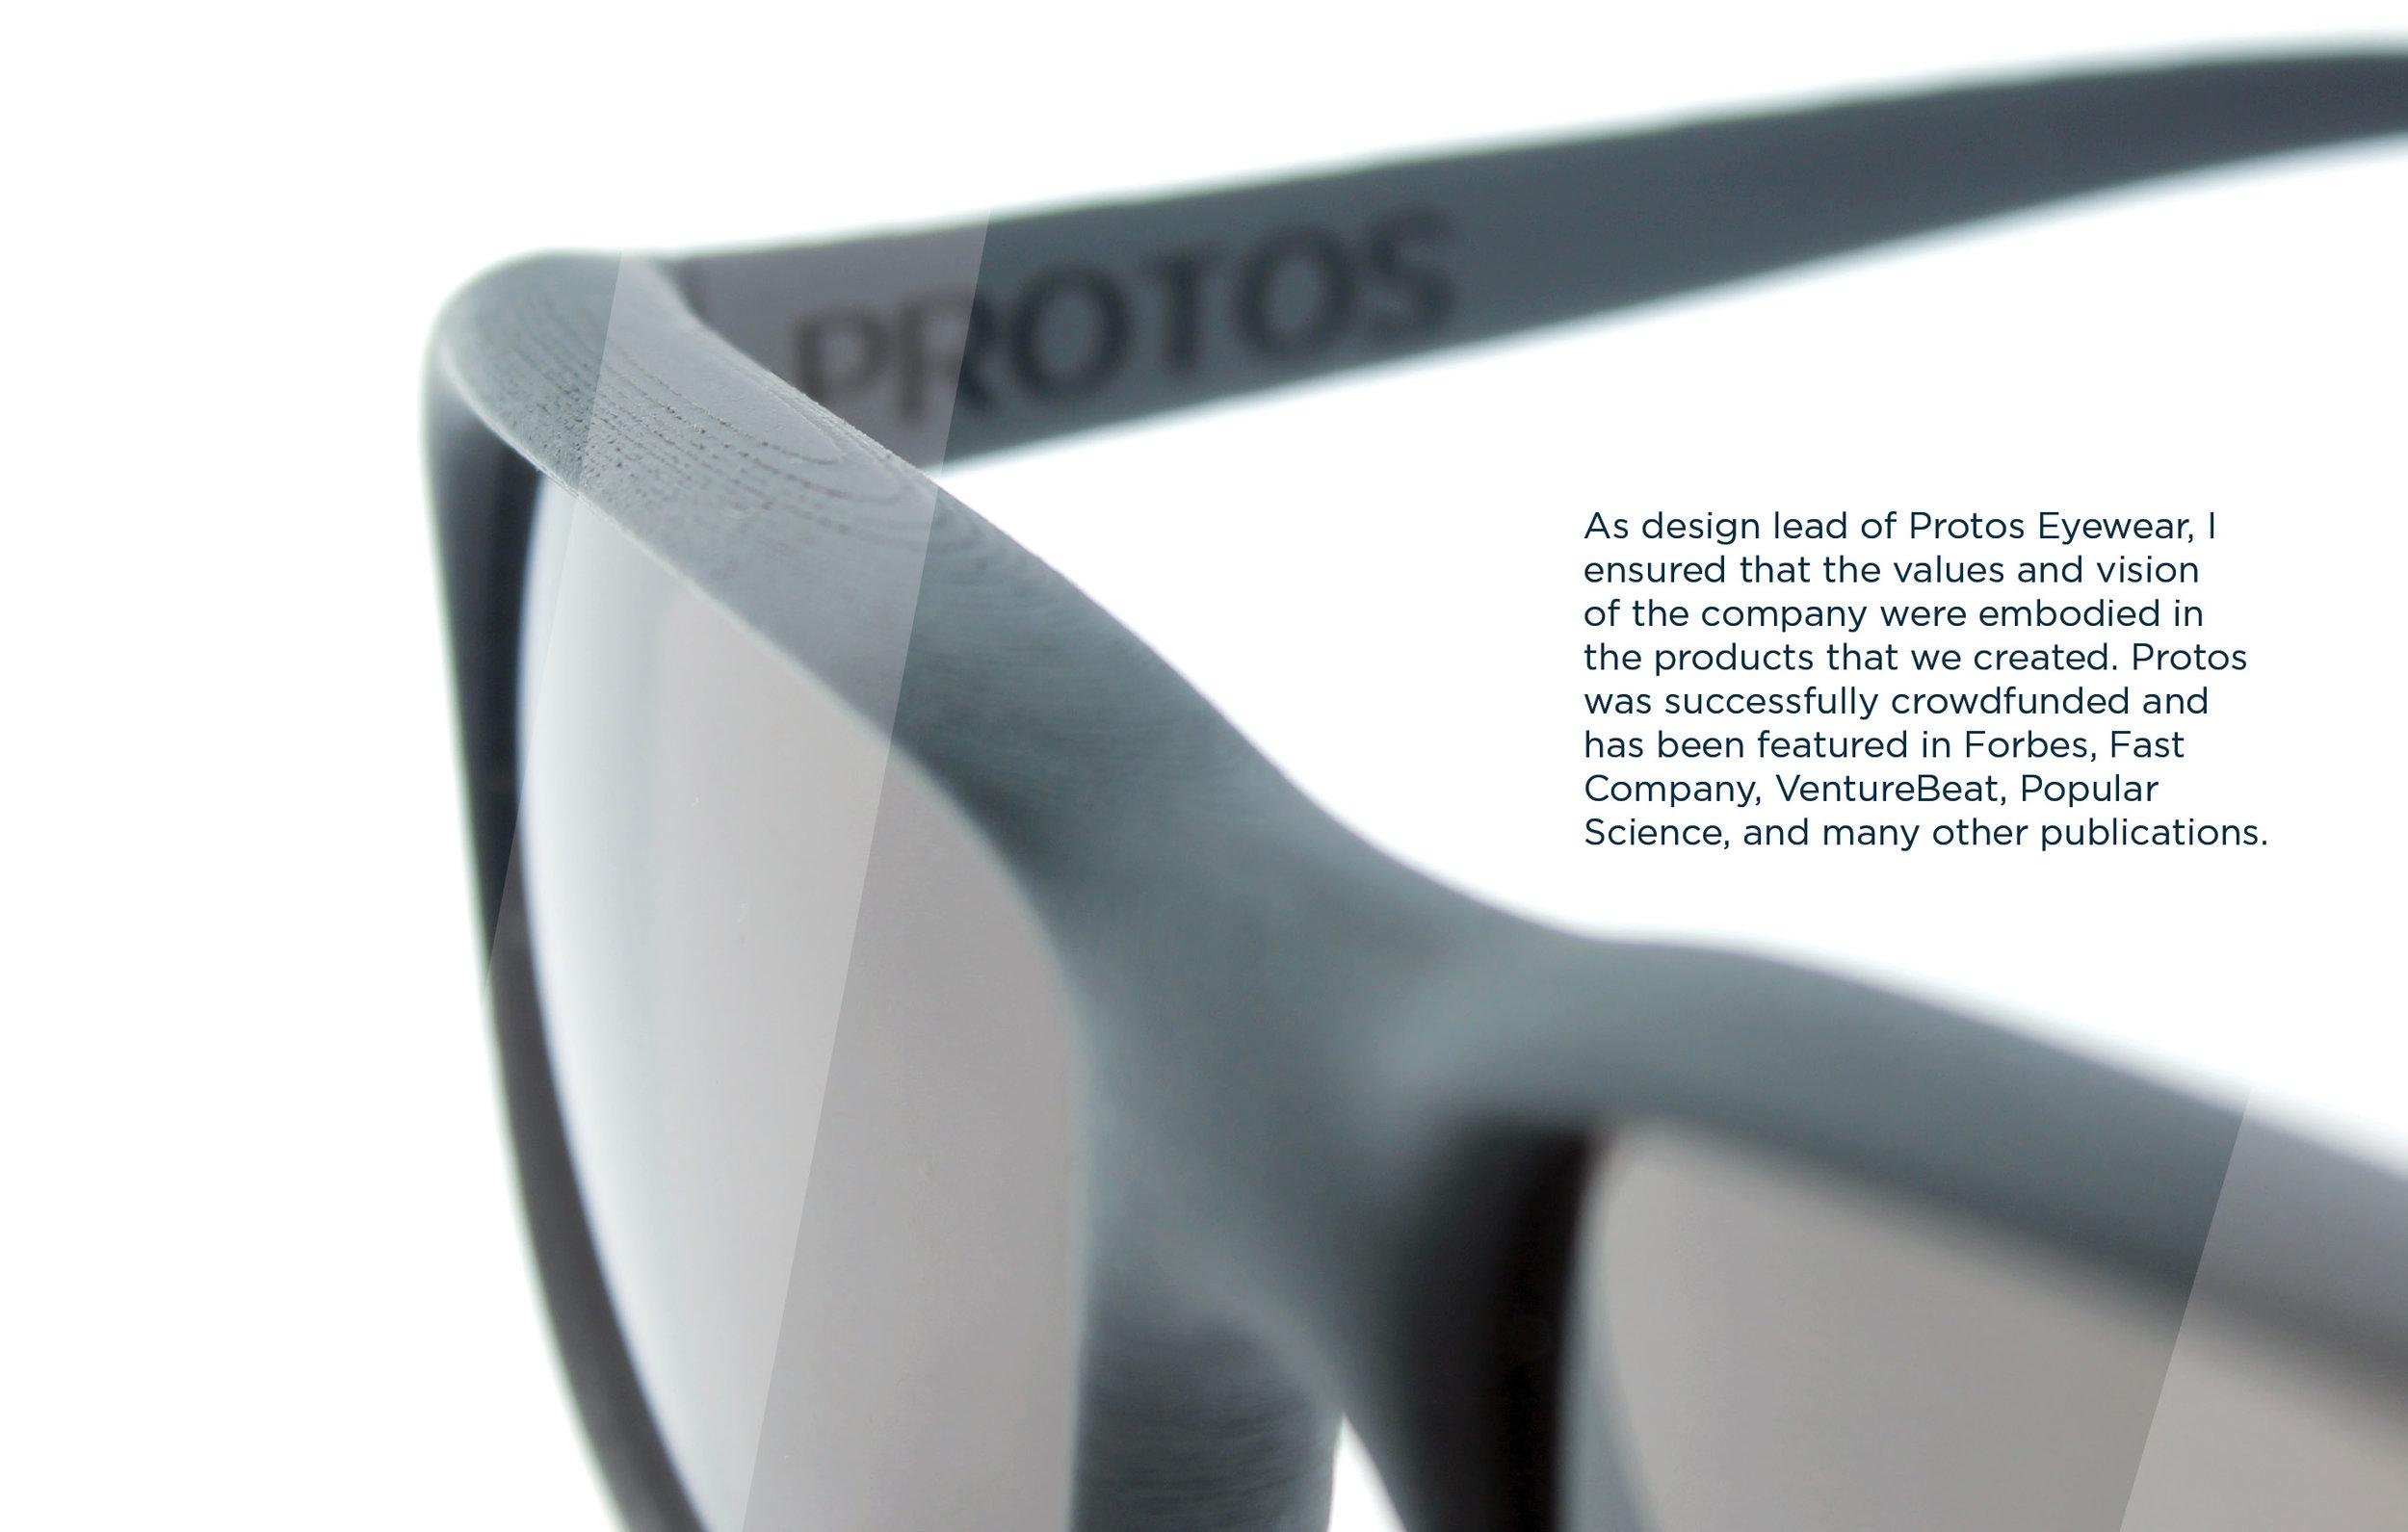 ProtosEyewear-July2018-Revised.jpg